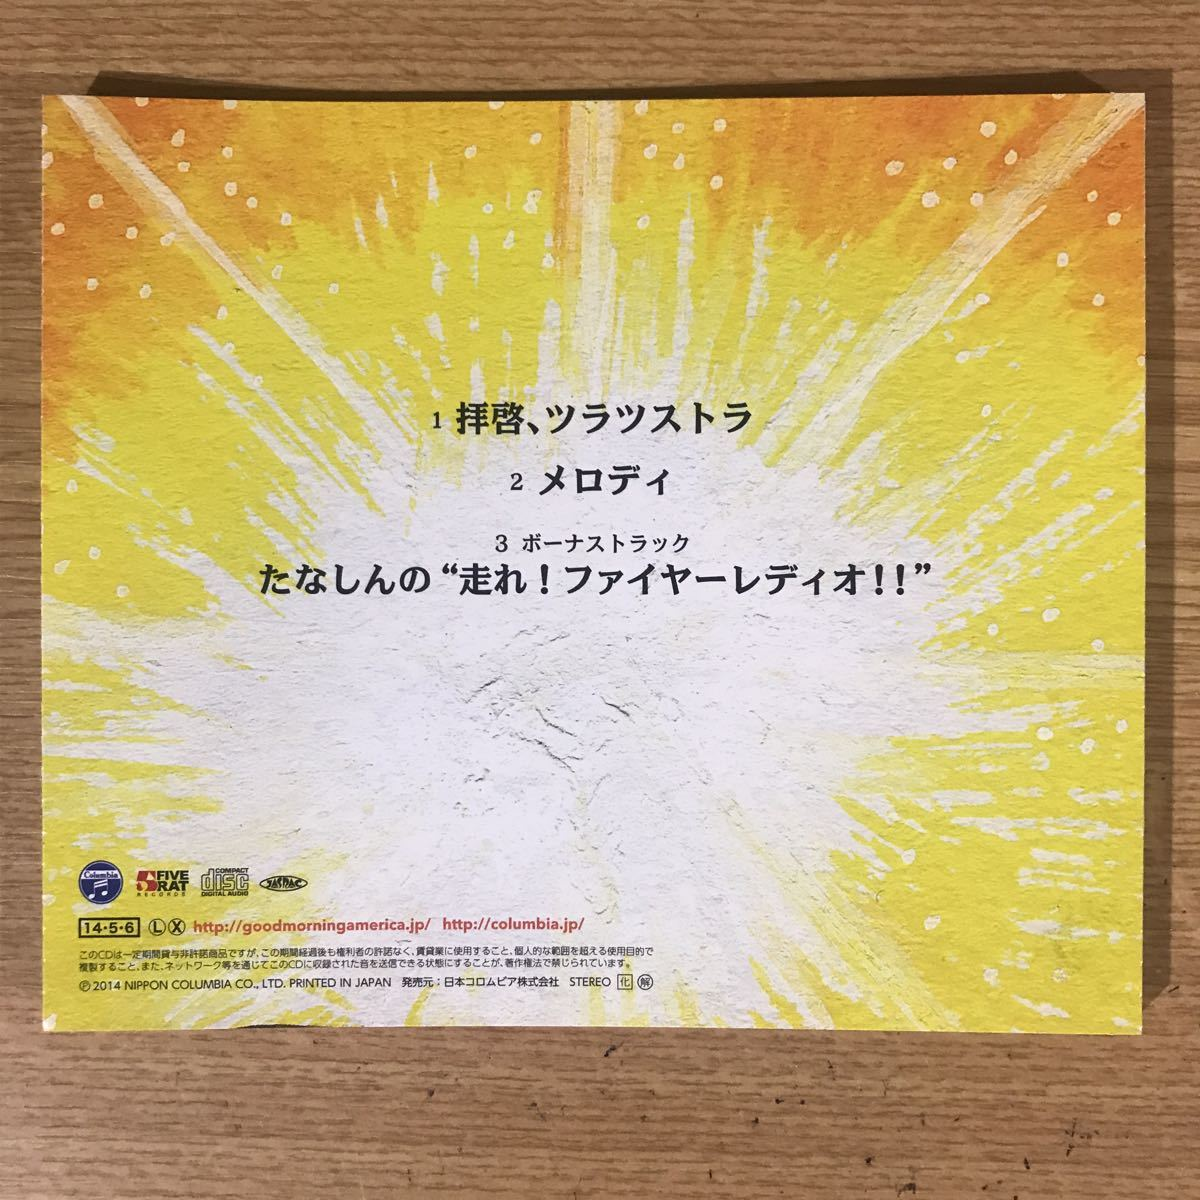 (B85)中古CD100円 グッドモーニングアメリカ 拝啓、ツラツストラ 初回盤B-type(CD)_画像2